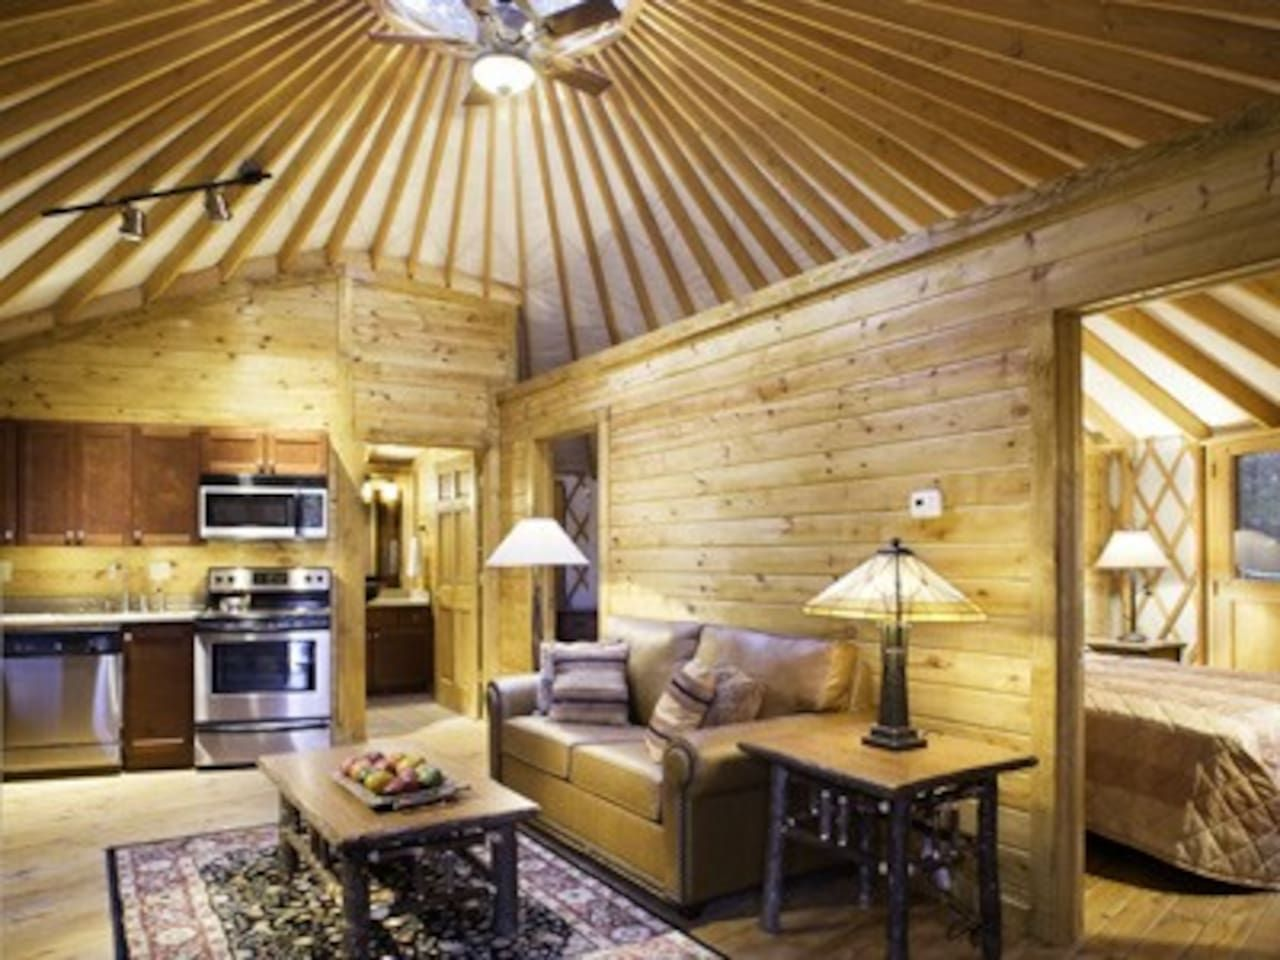 GLAMOROUS 2 BEDROOM YURT  SLEEP 6!   Yurts For Rent In Gordonsville,  Virginia